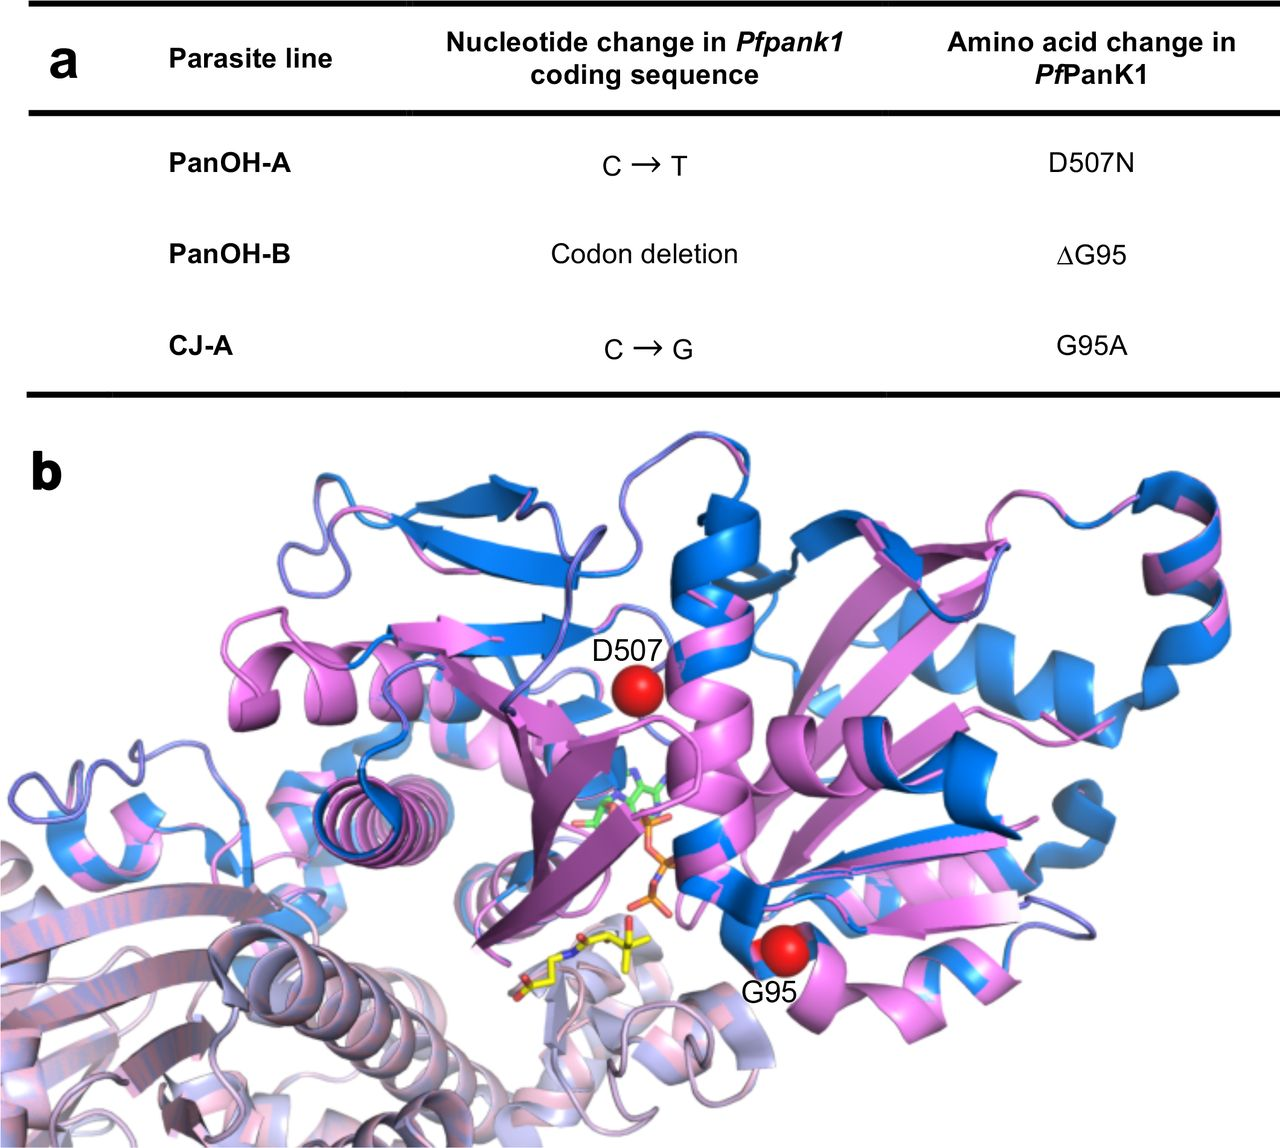 Mutations in the pantothenate kinase of Plasmodium falciparum confer